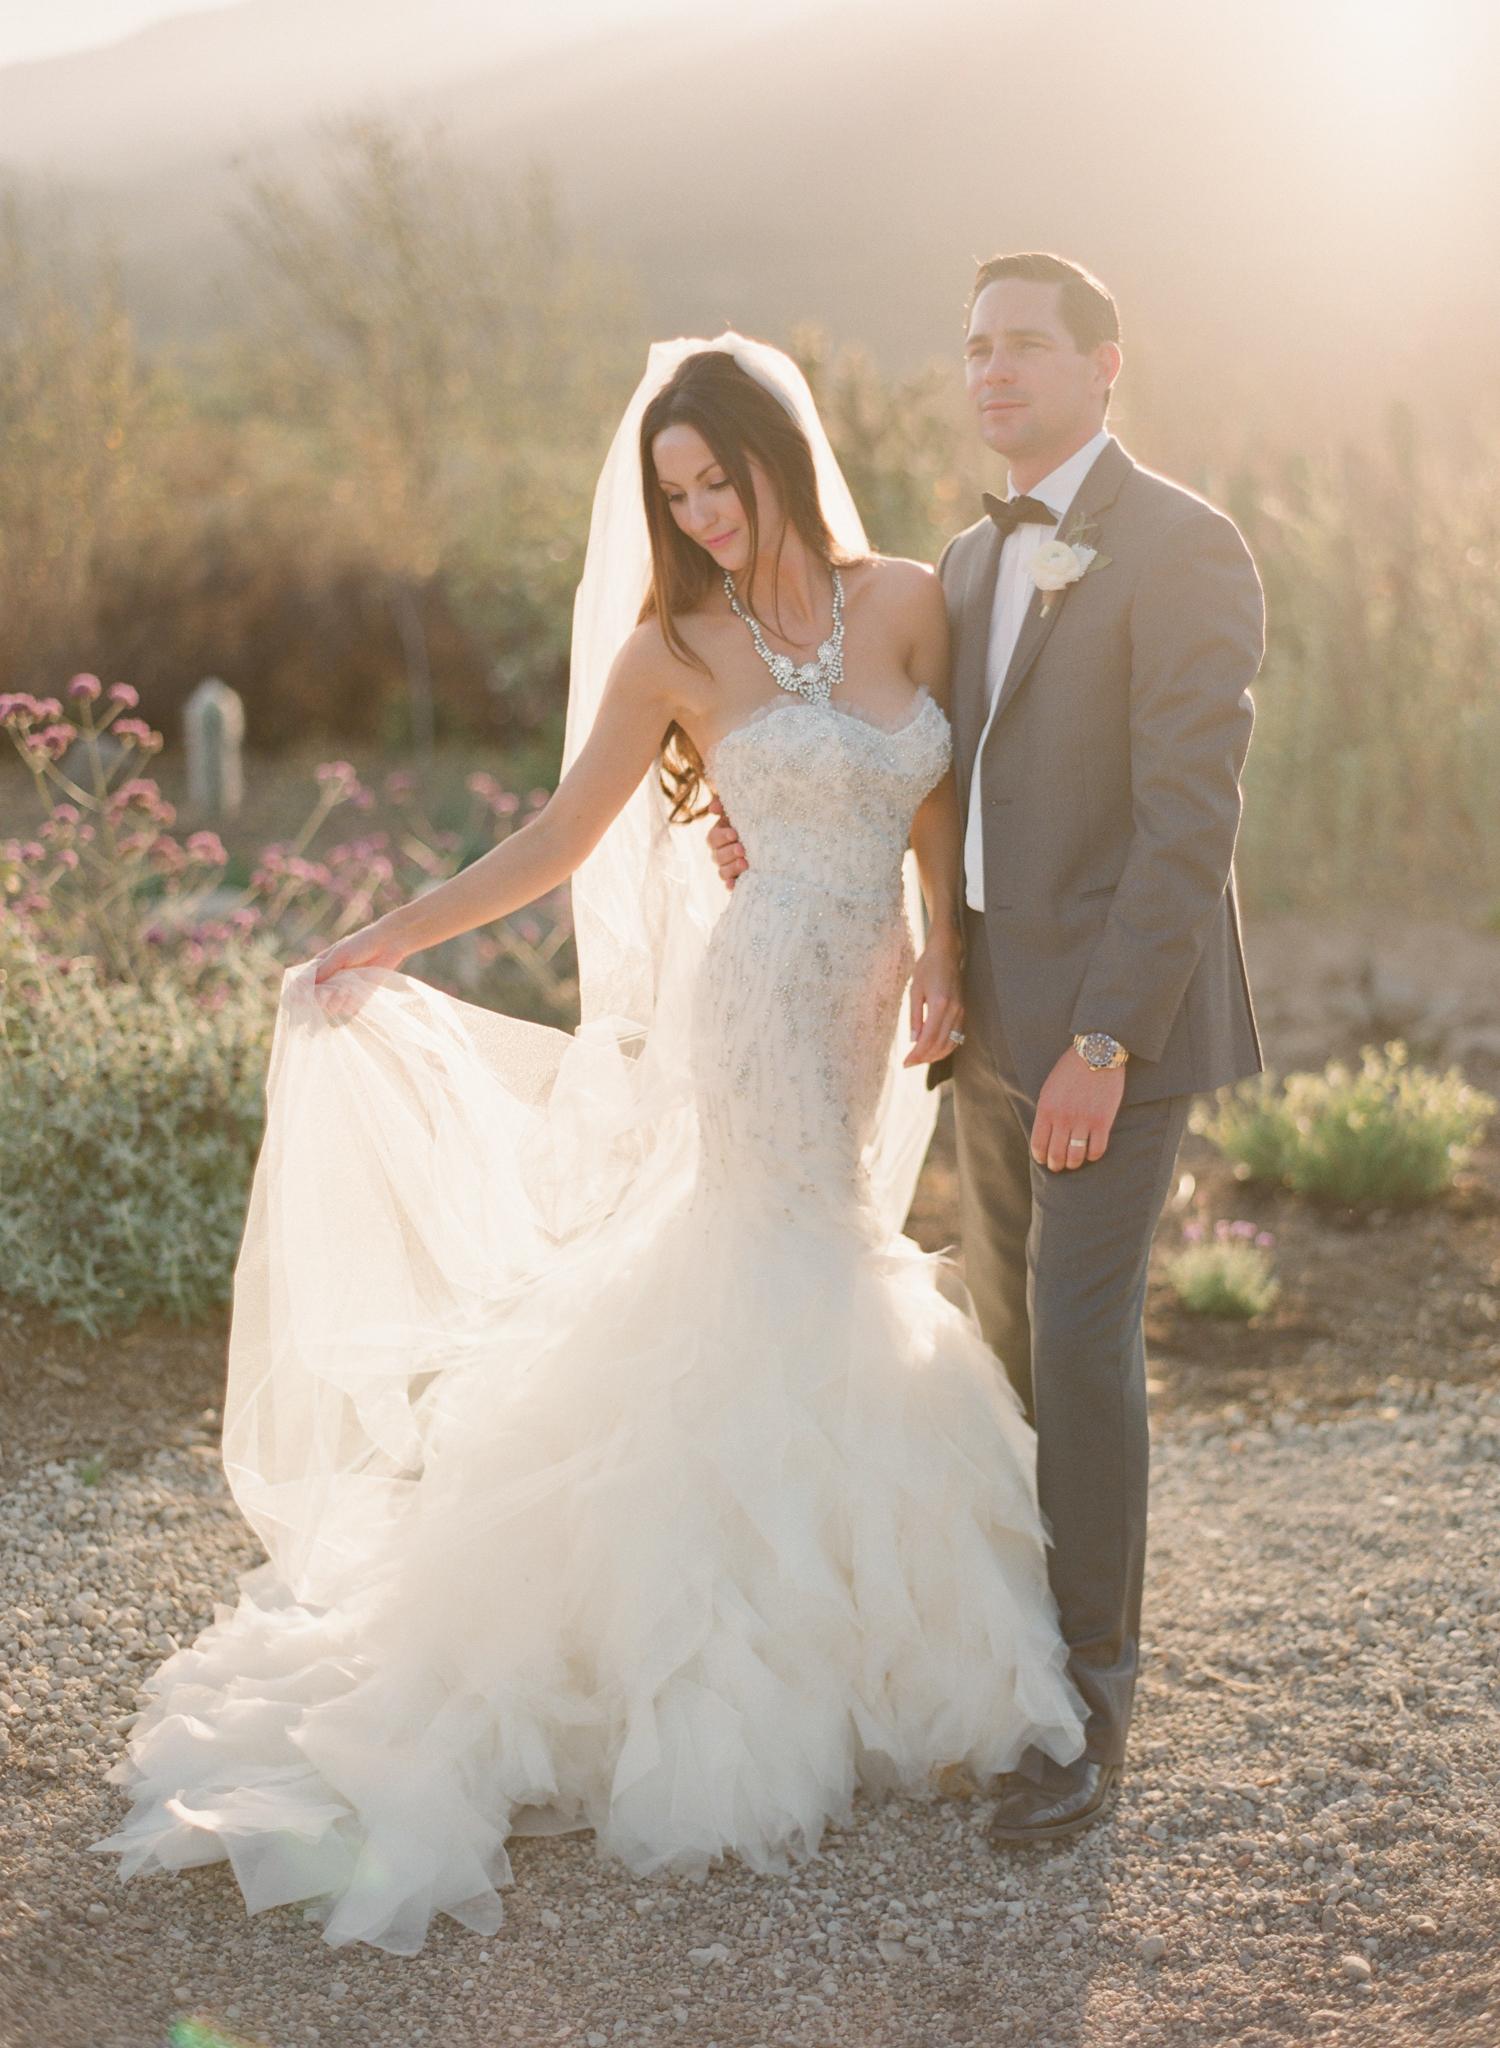 17 Private Estate Wedding Event Design by Joy Proctor.JPG